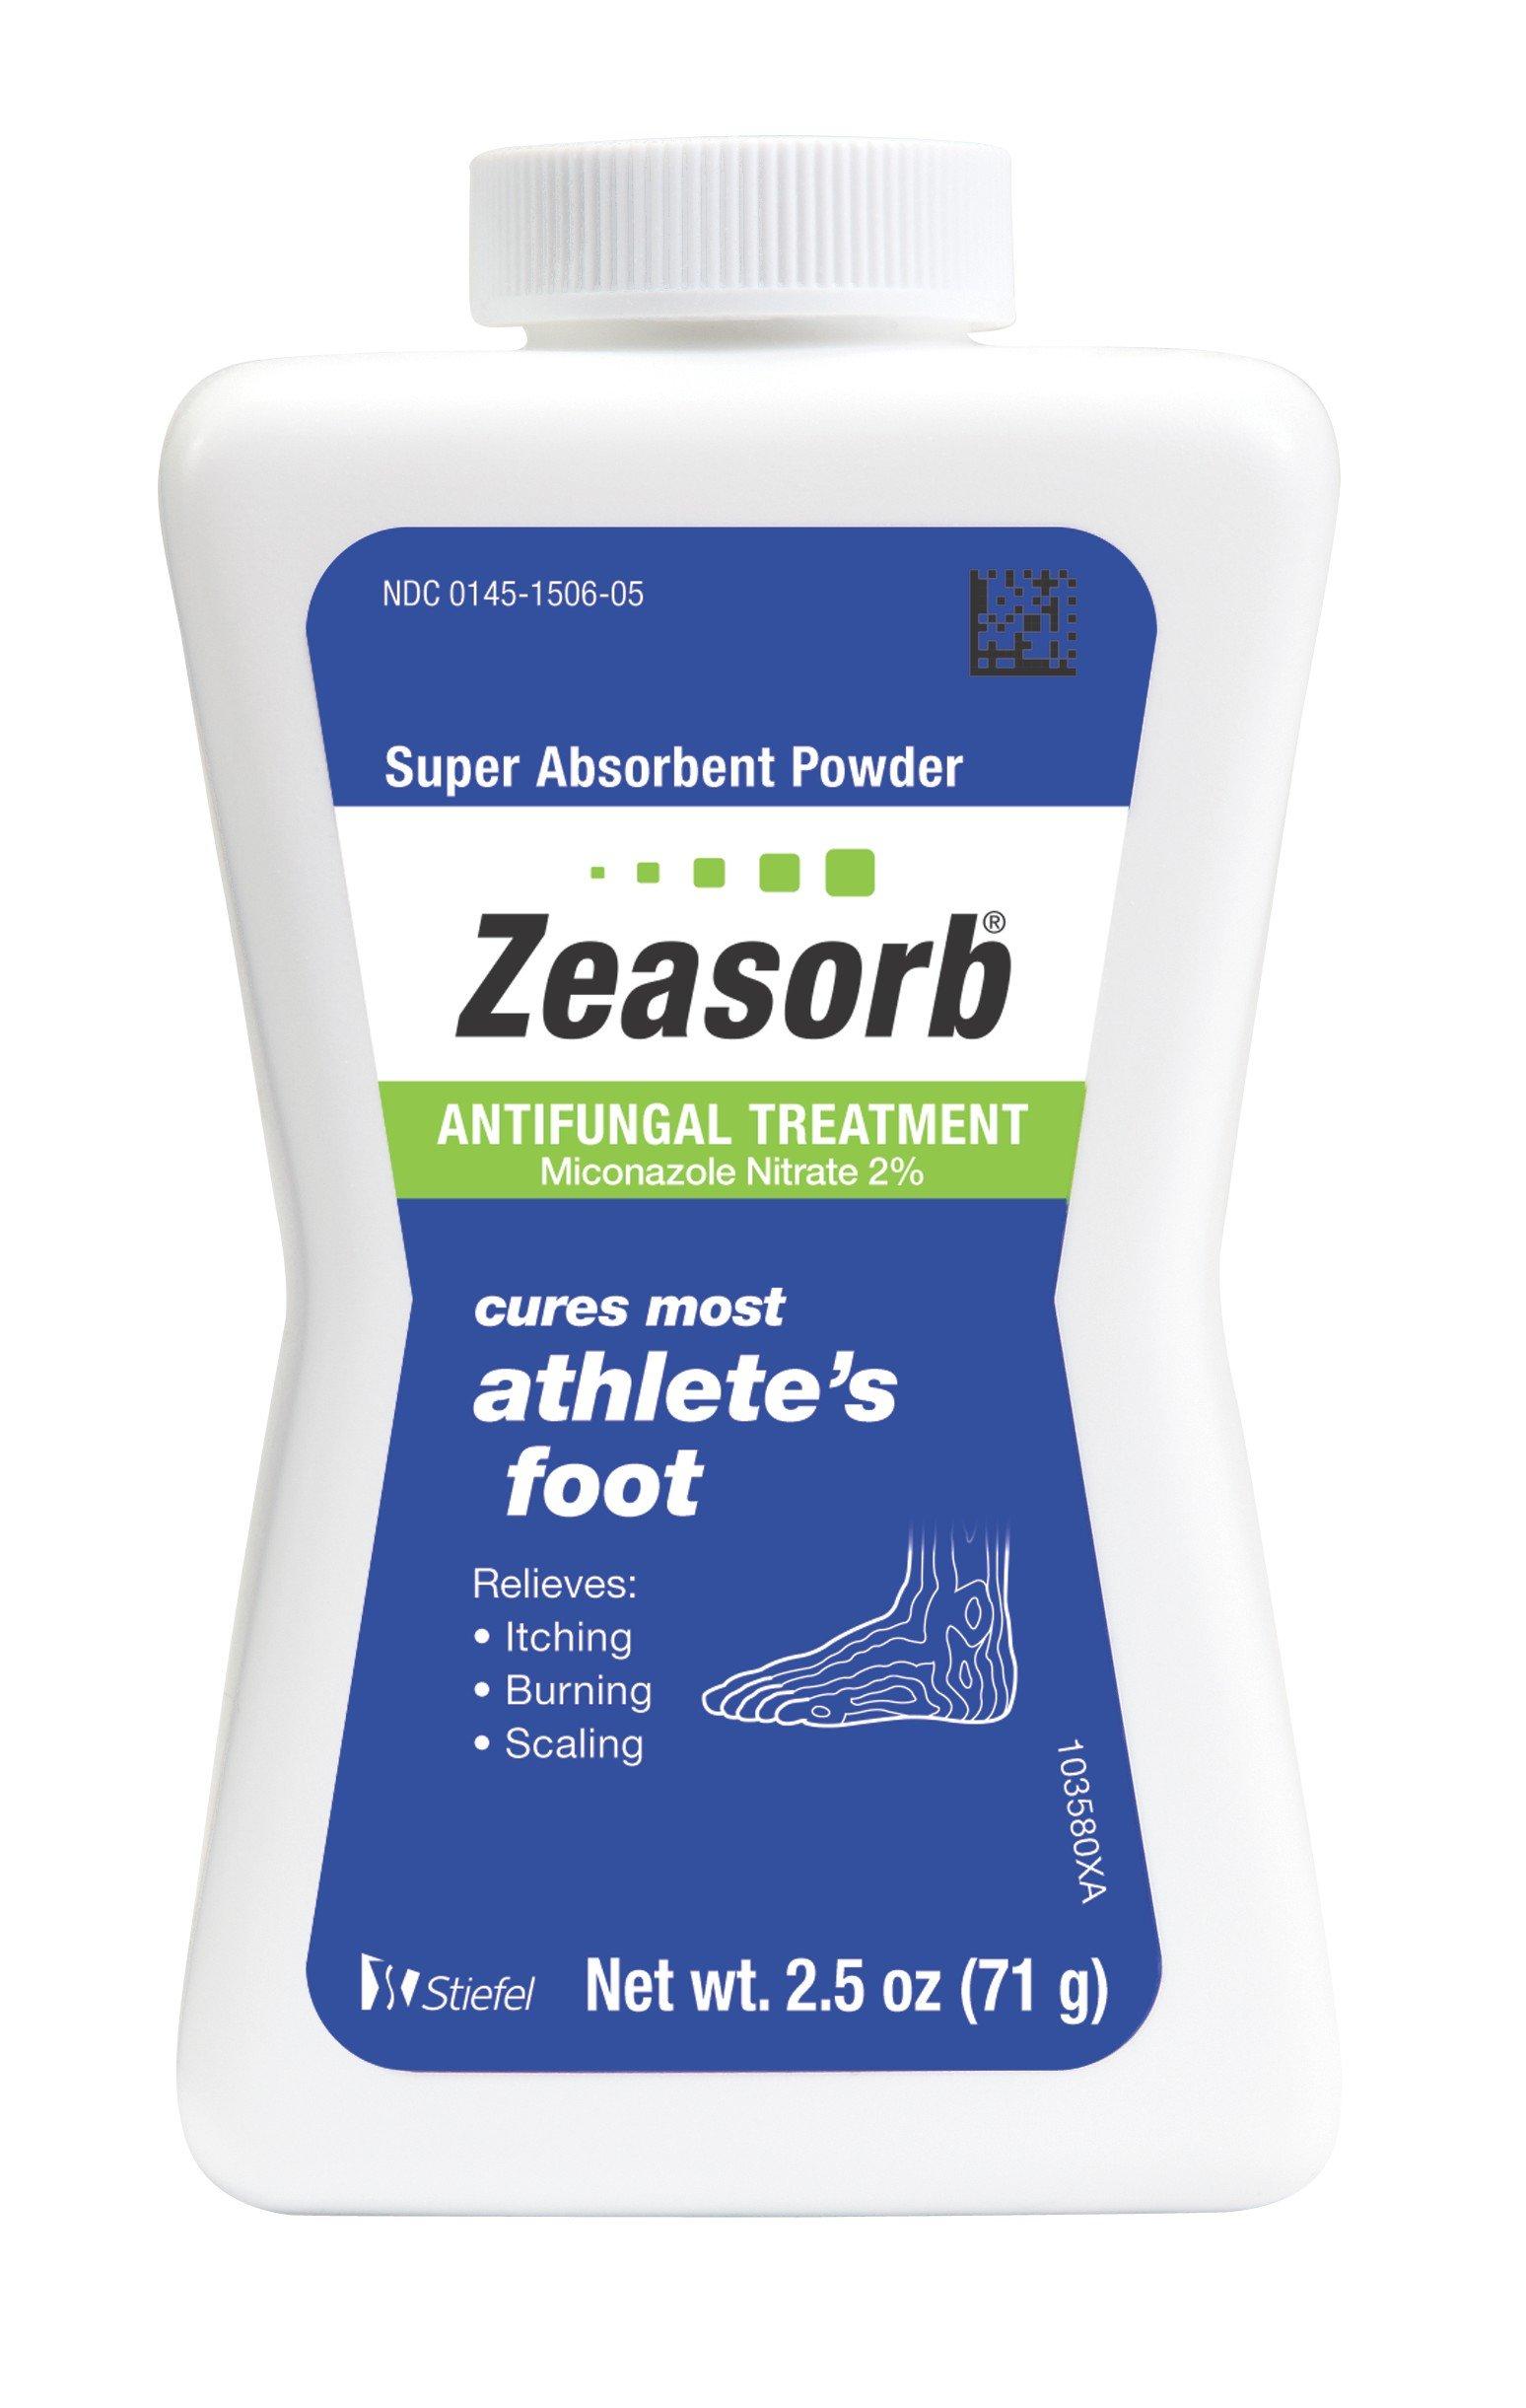 Zeasorb Antifungal Treatment Powder, Athletes Foot, 2.5oz